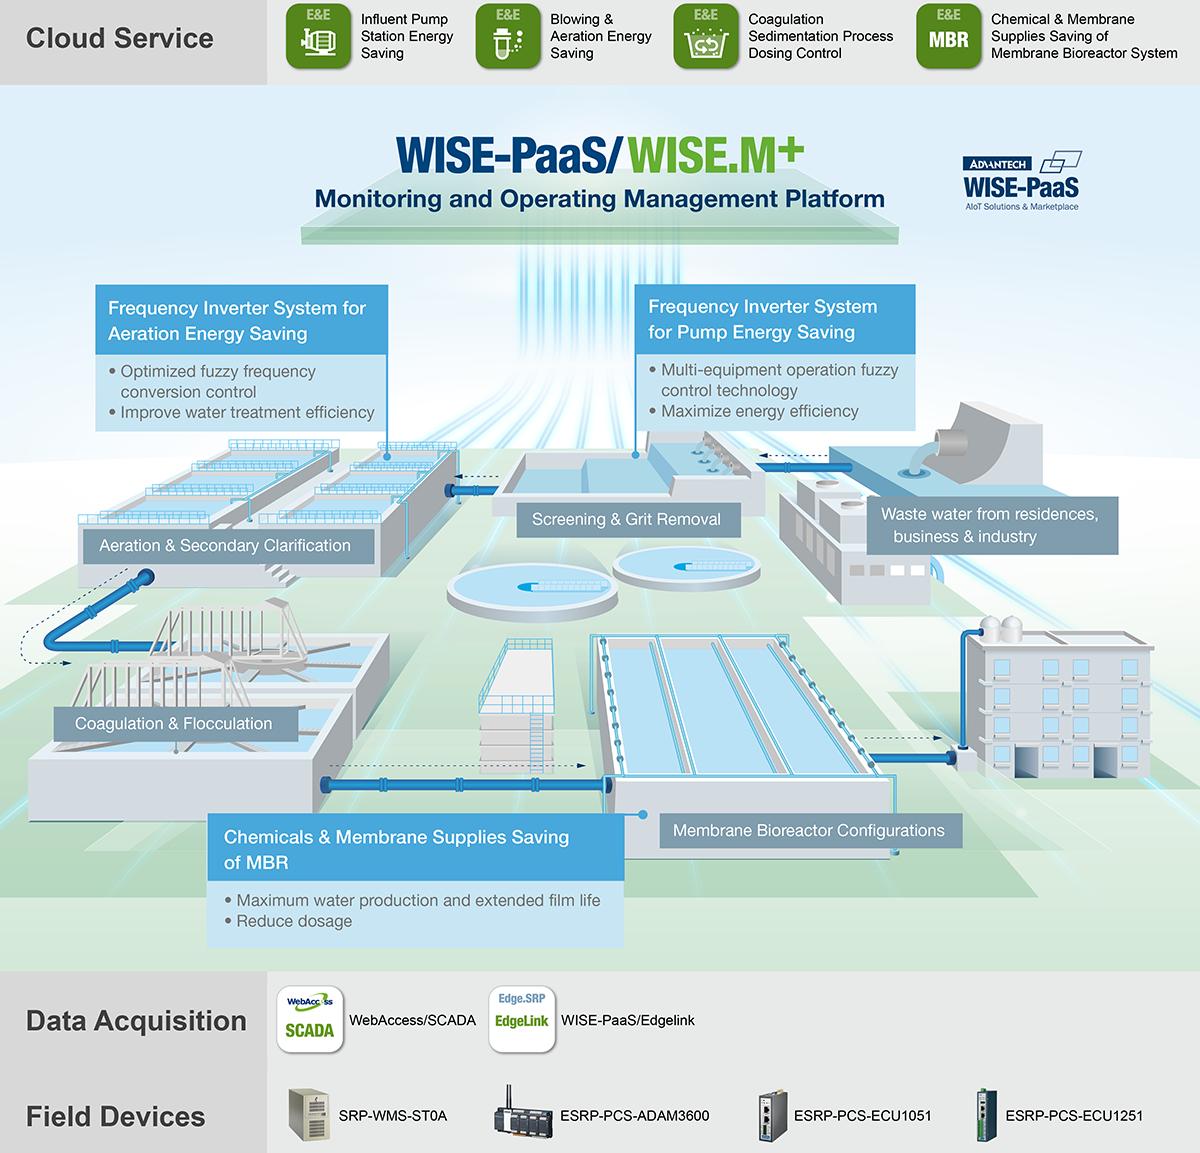 EnergyEnvironment_WastewaterTreatmentManagement_Architecture_1.png